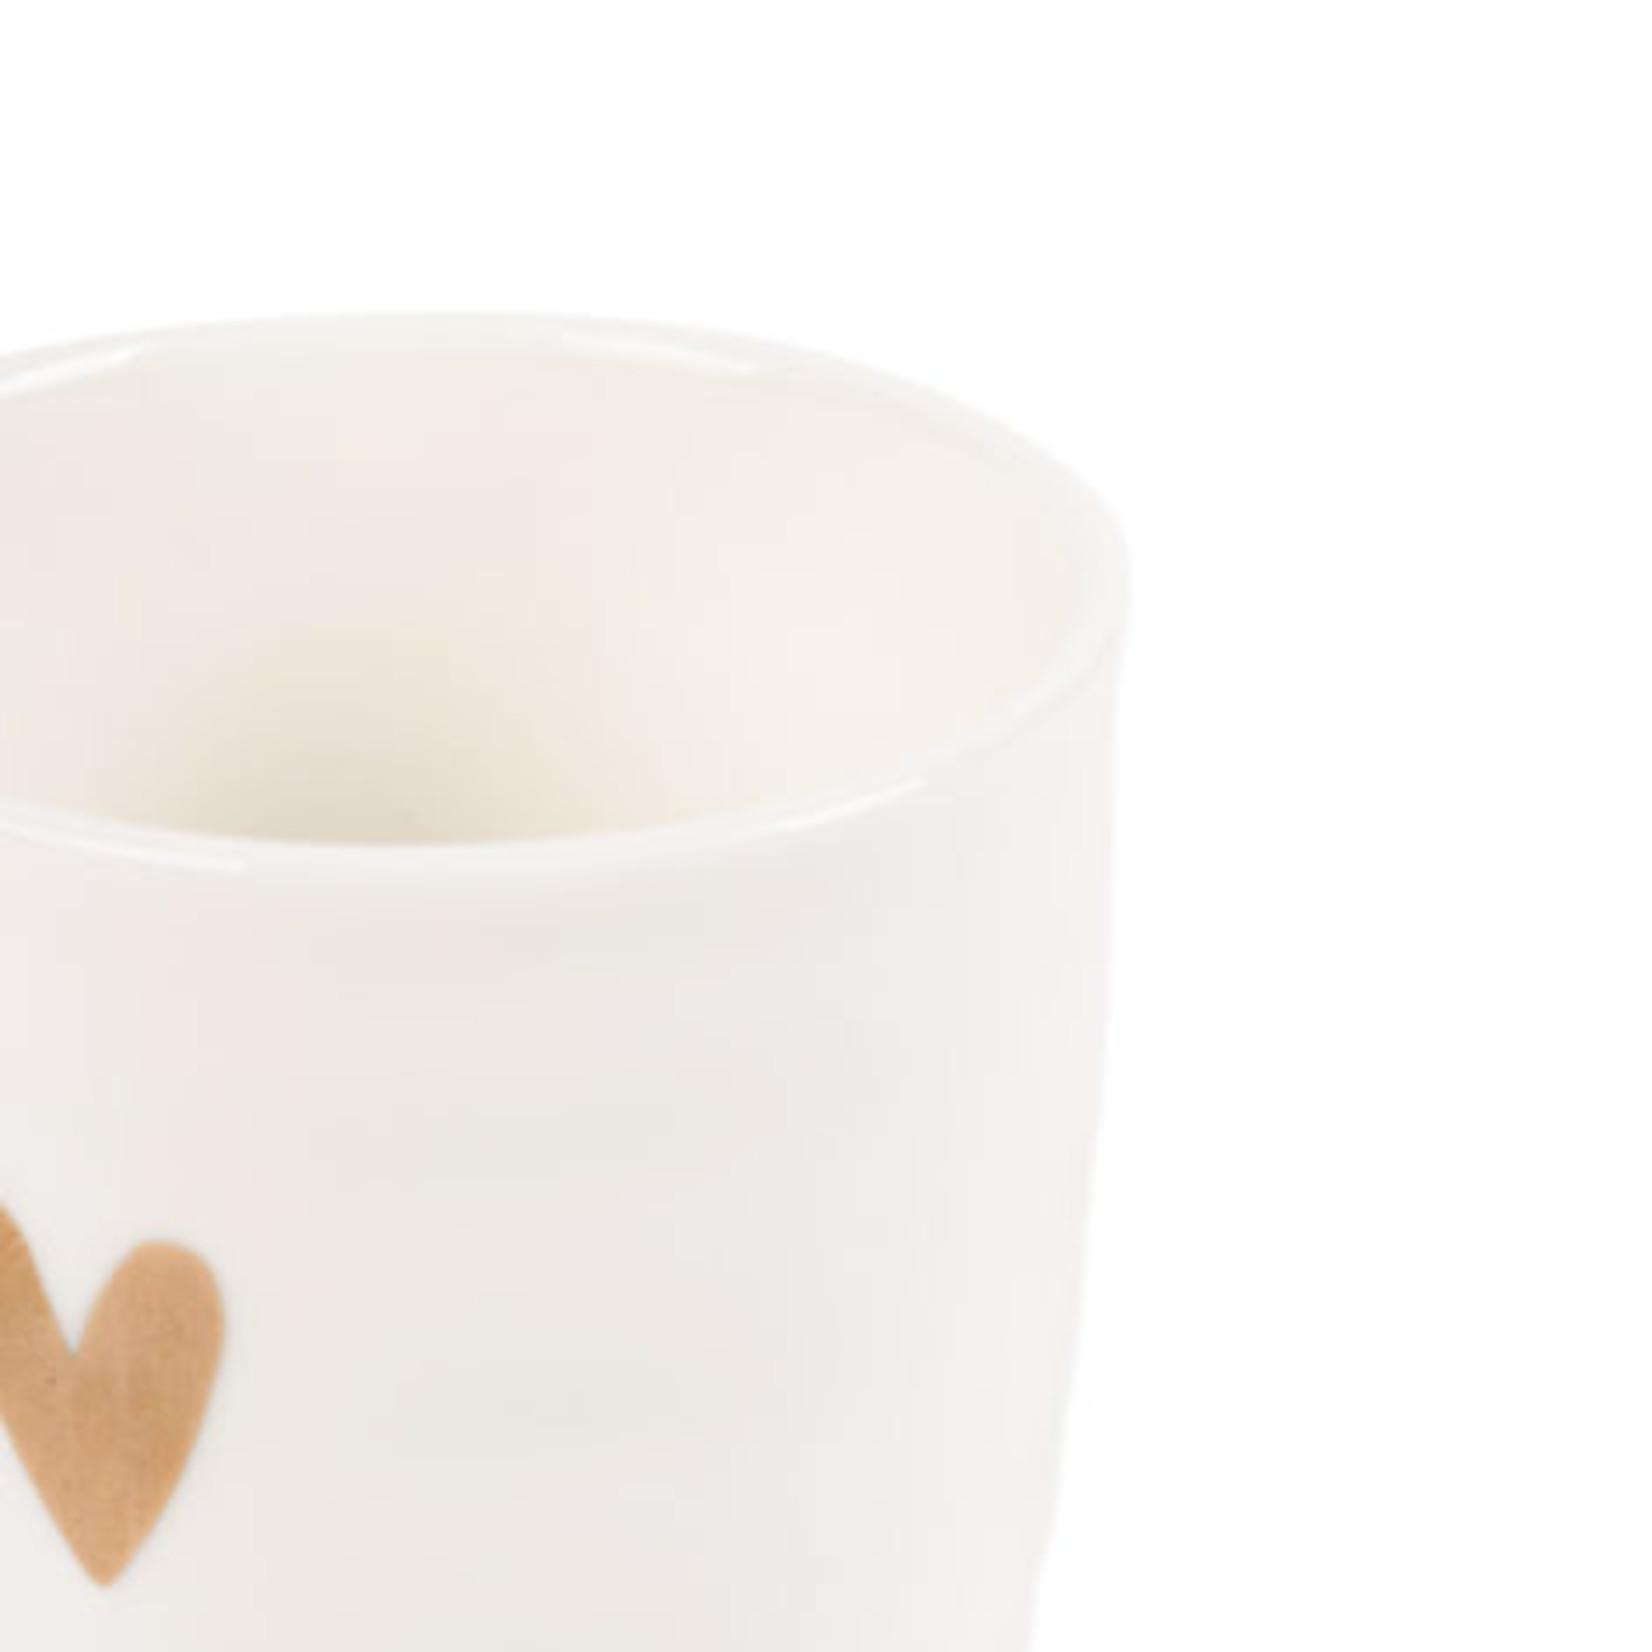 Zusss Espressokopje - Goud hartje - Wit